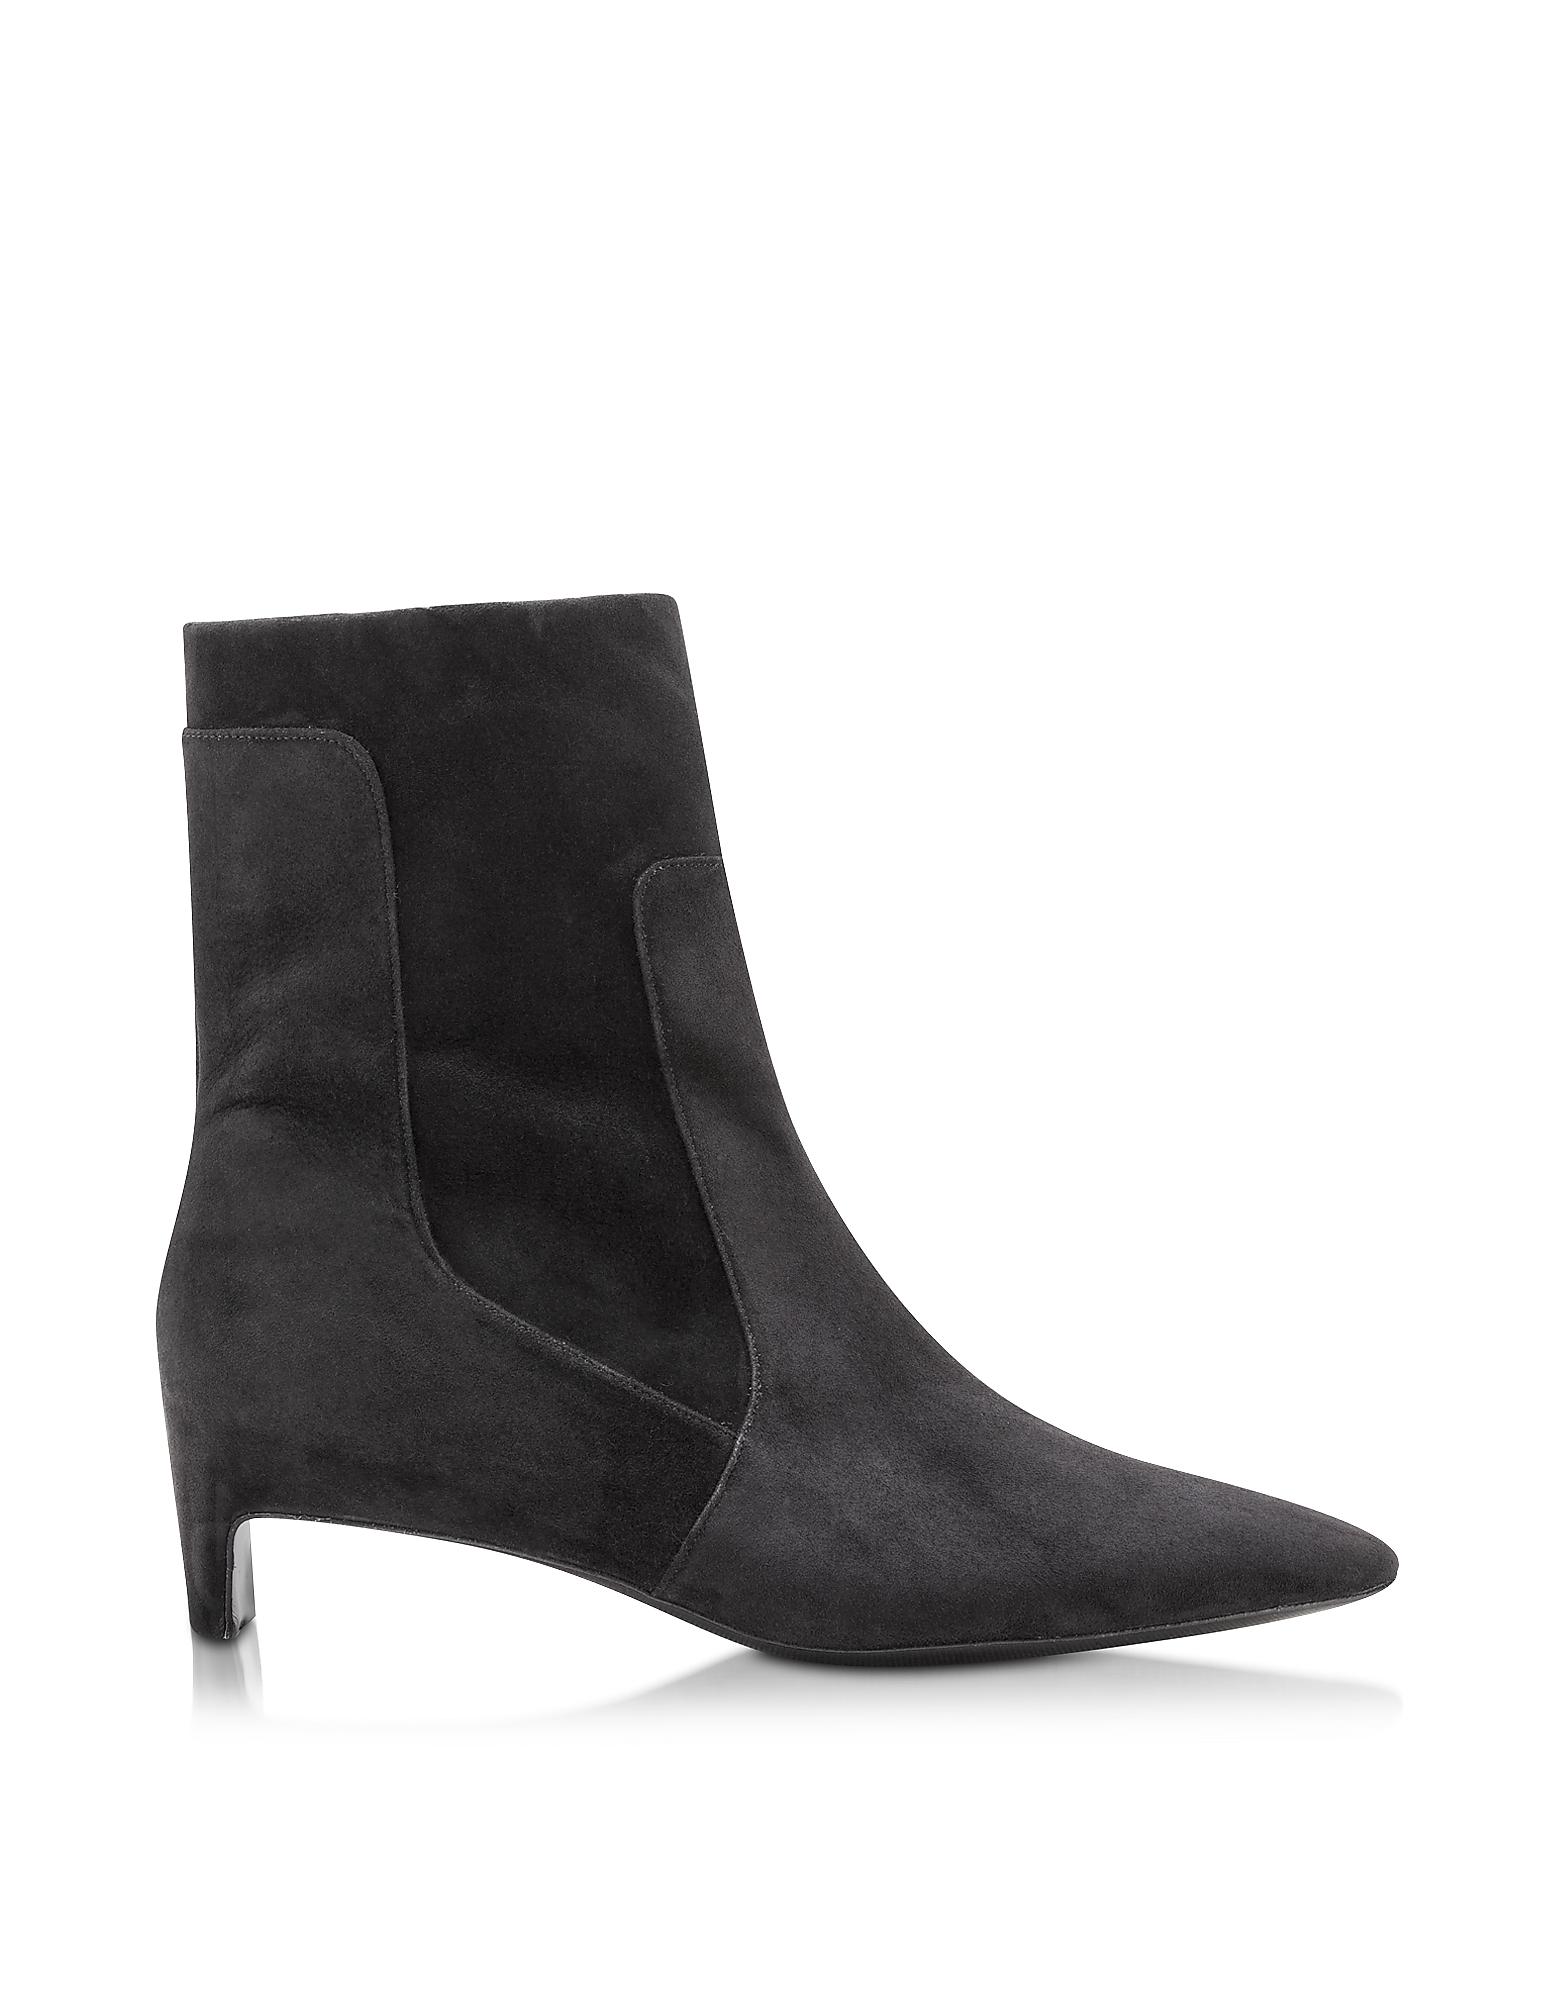 robert clergerie admir black suede mid heel boot in black